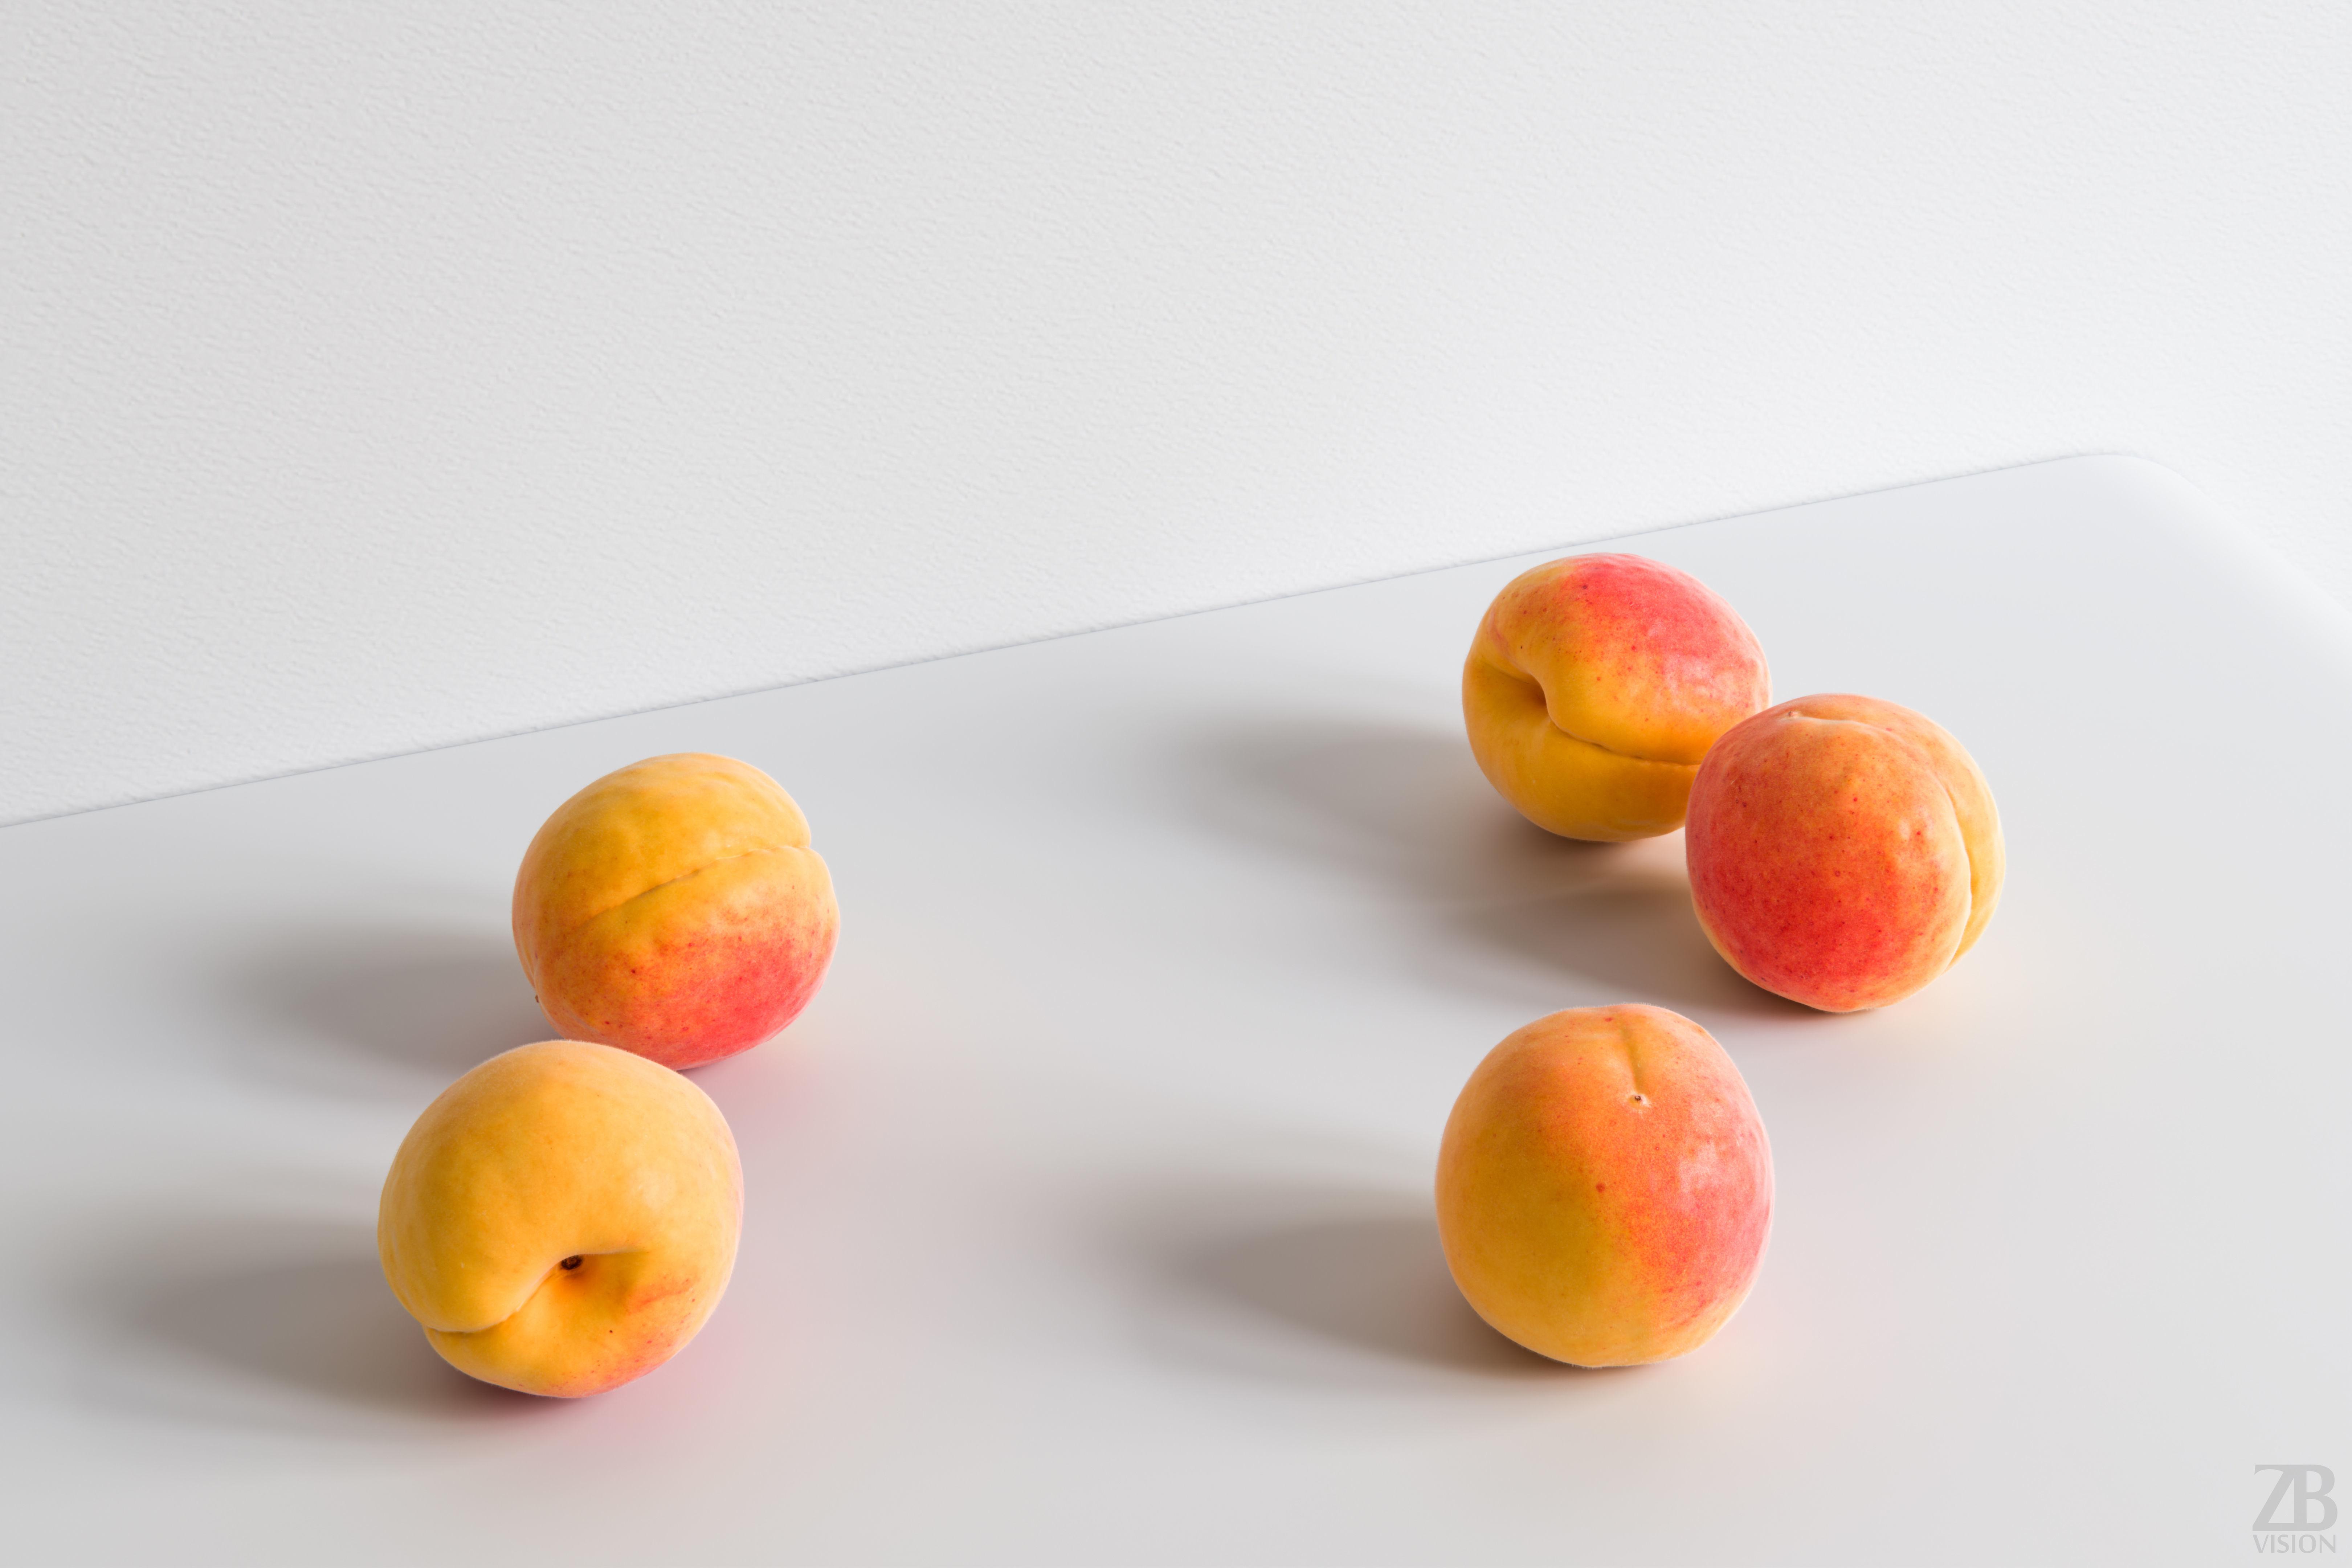 Apricot 002